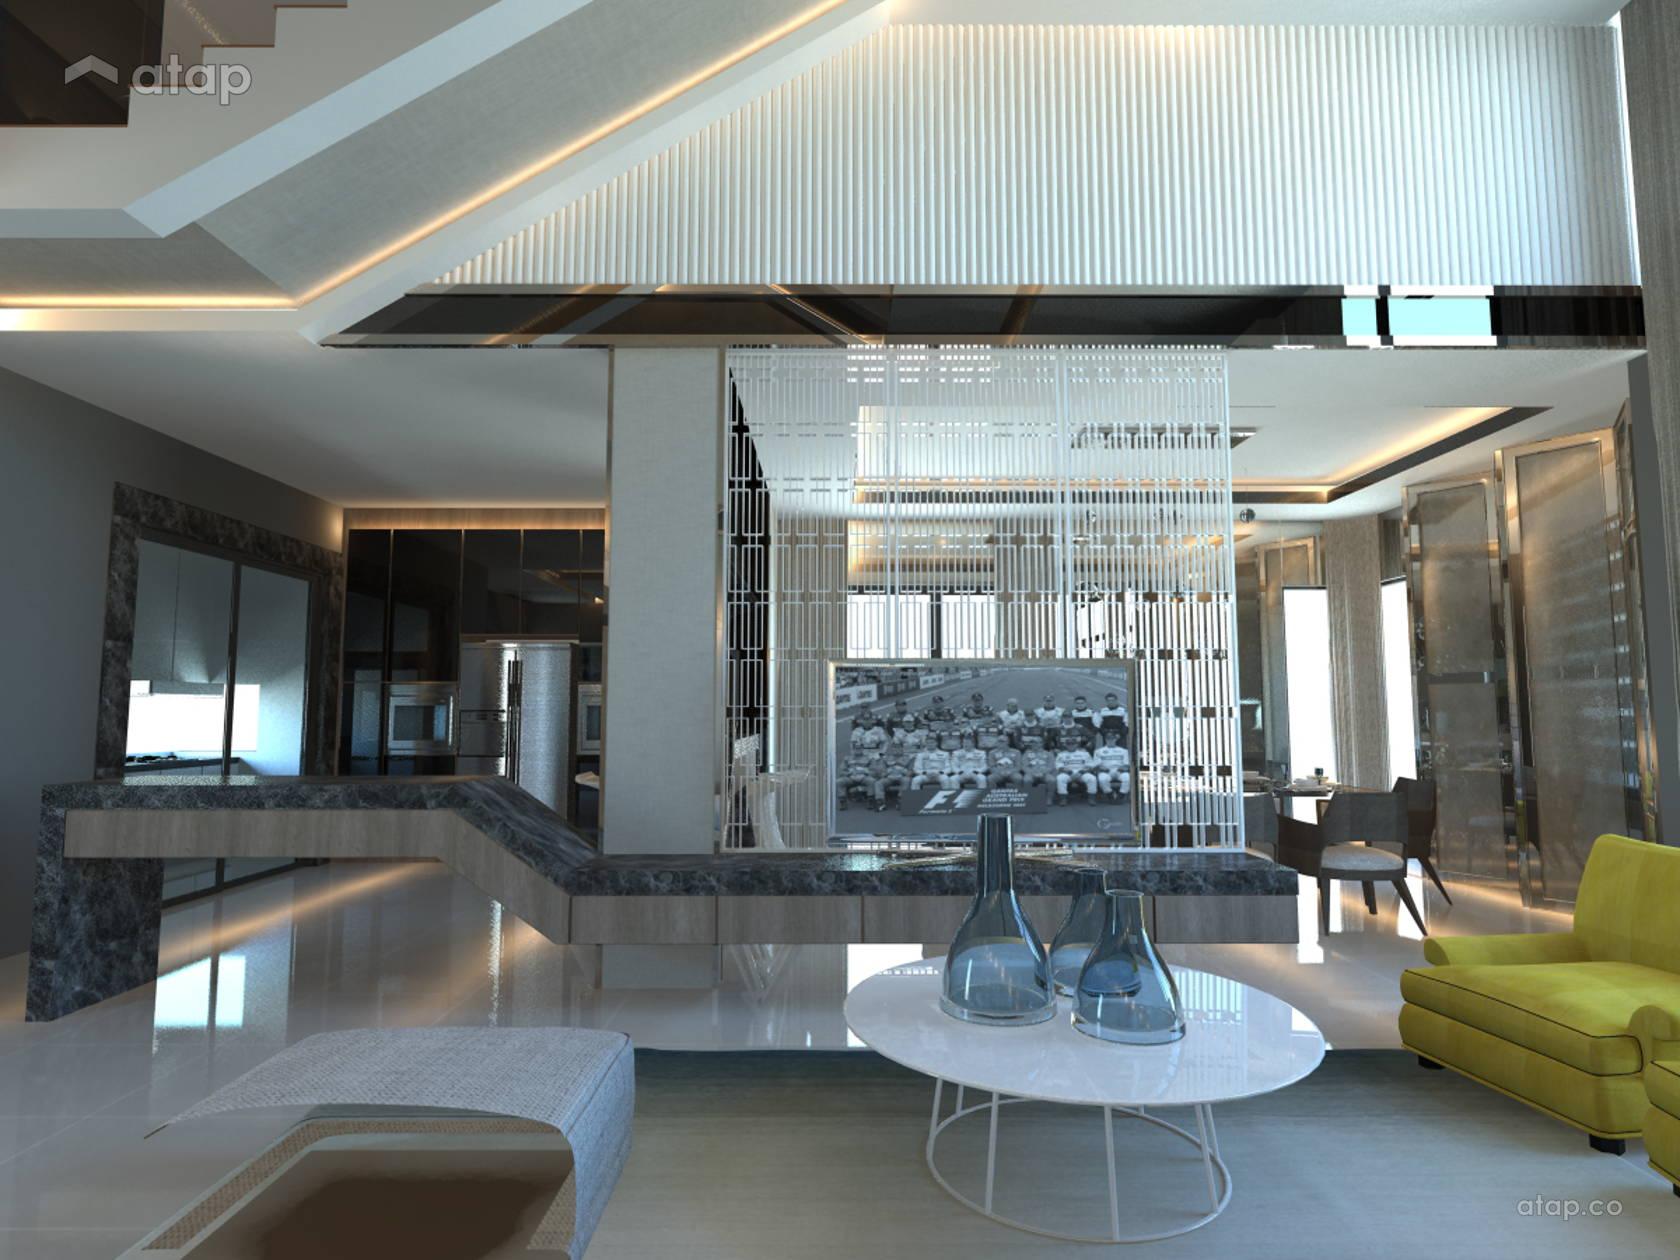 Delightful Mansion, Desa Park City Interior Design Renovation Ideas, Photos And Price  In Malaysia | Atap.co